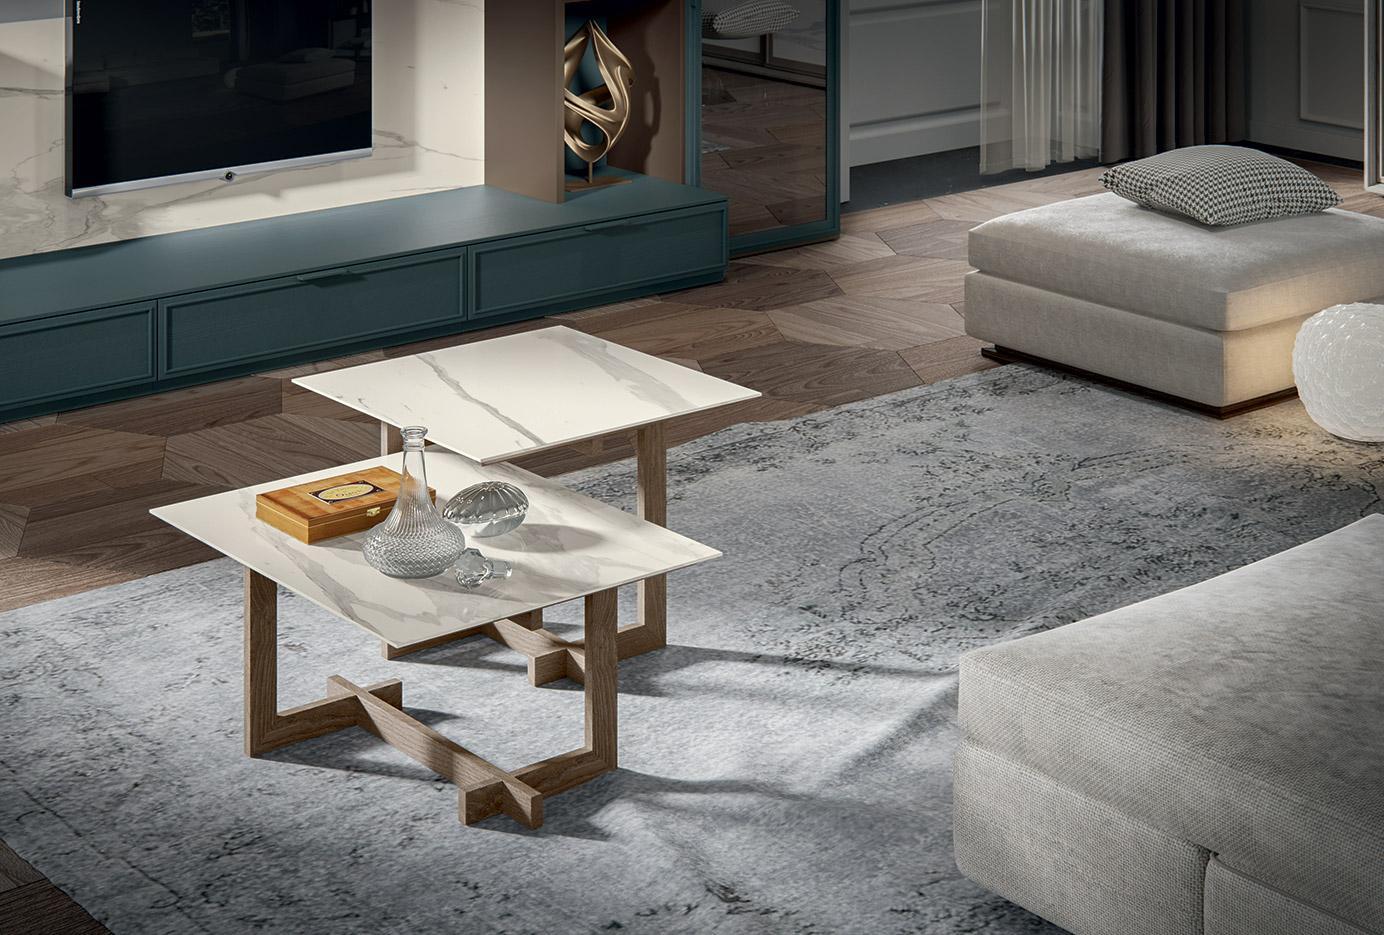 Tavoli e sedie zenith mobilgam for Sedie e tavoli design